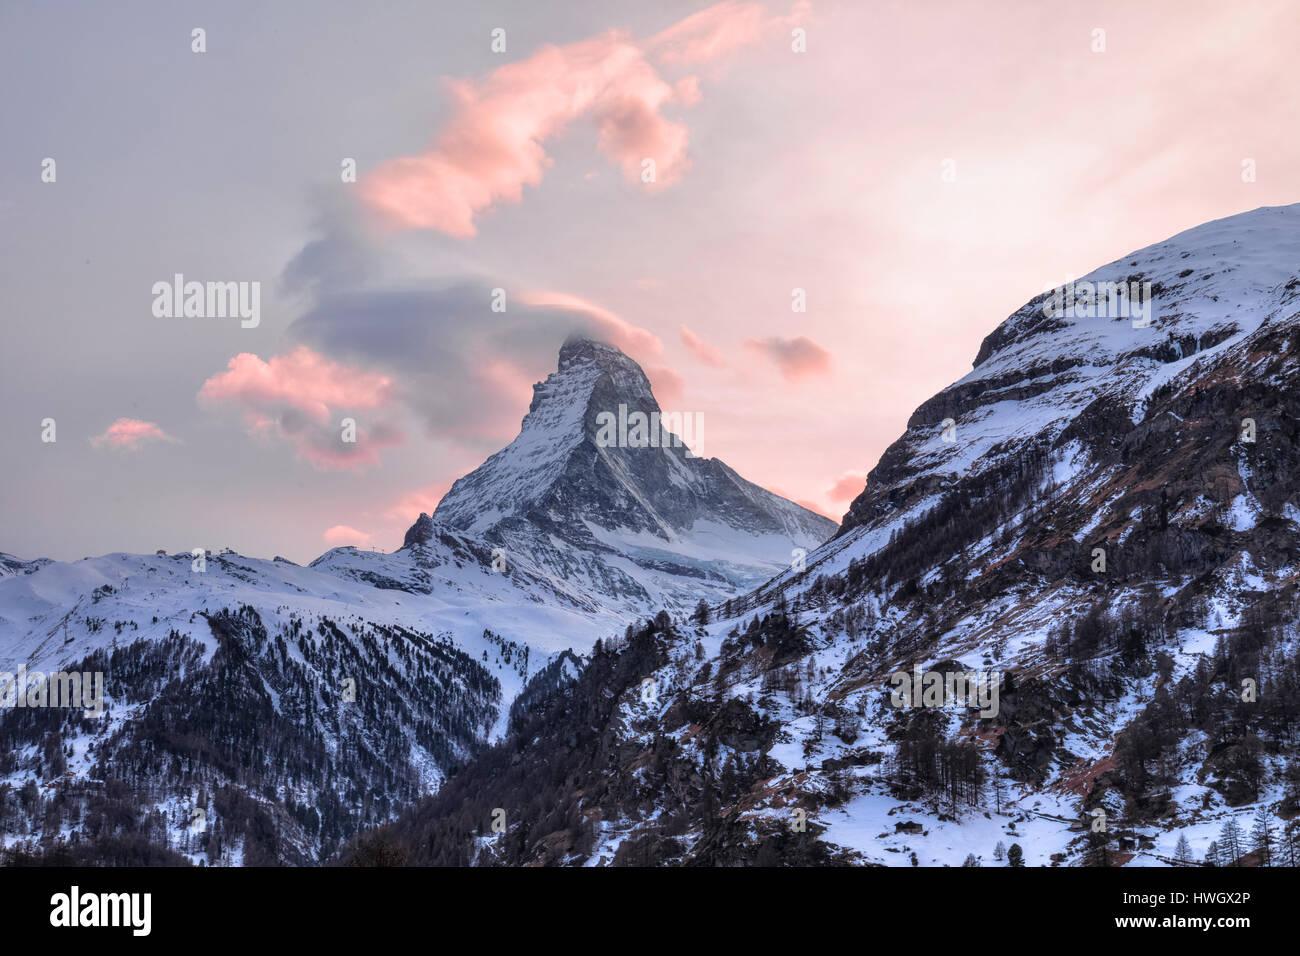 Matterhorn, Zermatt, Valais, Switzerland, Europe - Stock Image